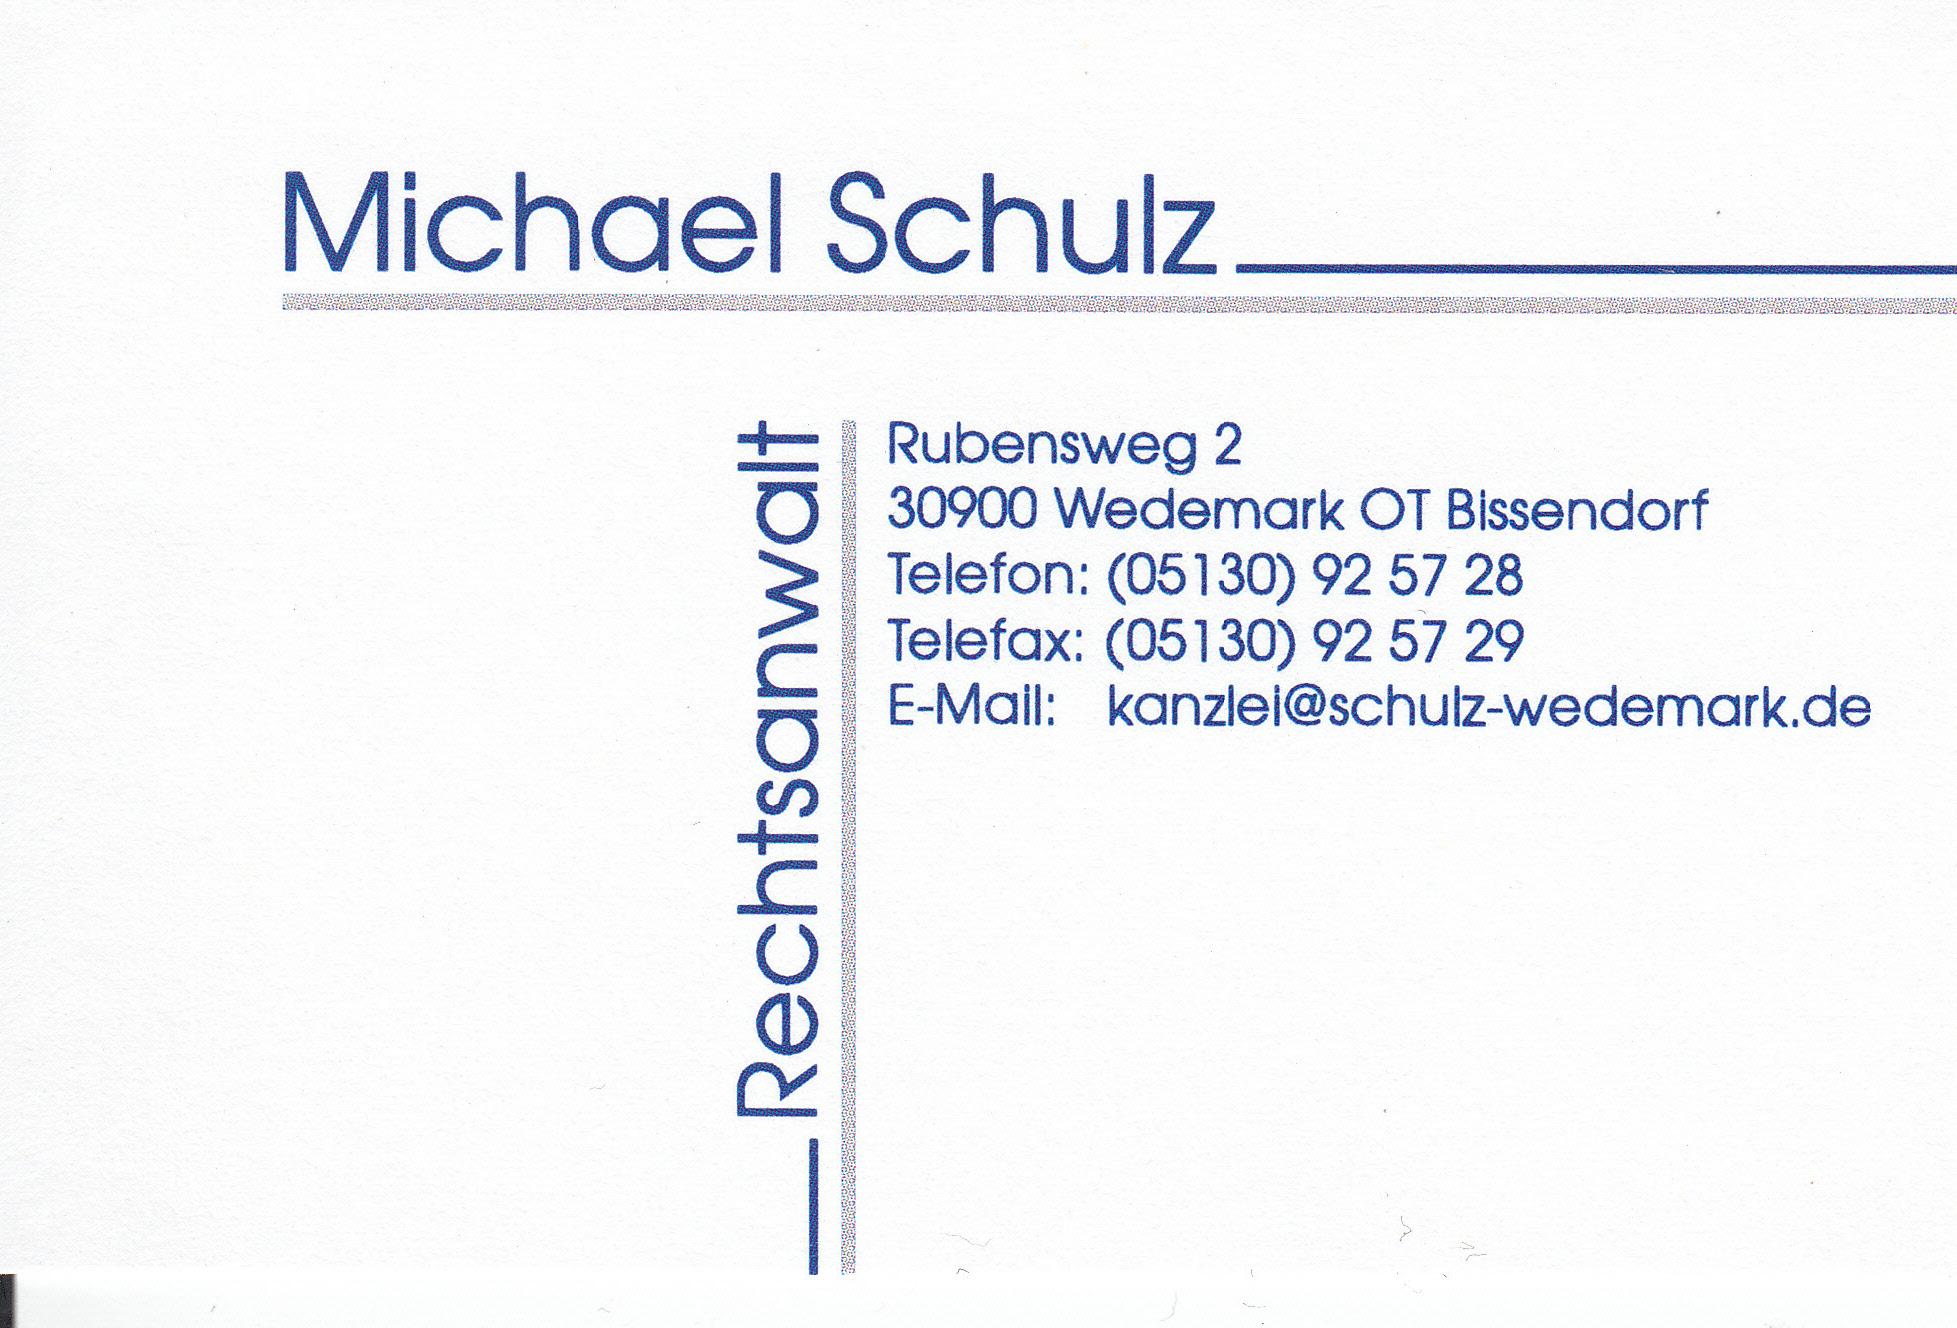 Schulz Michael